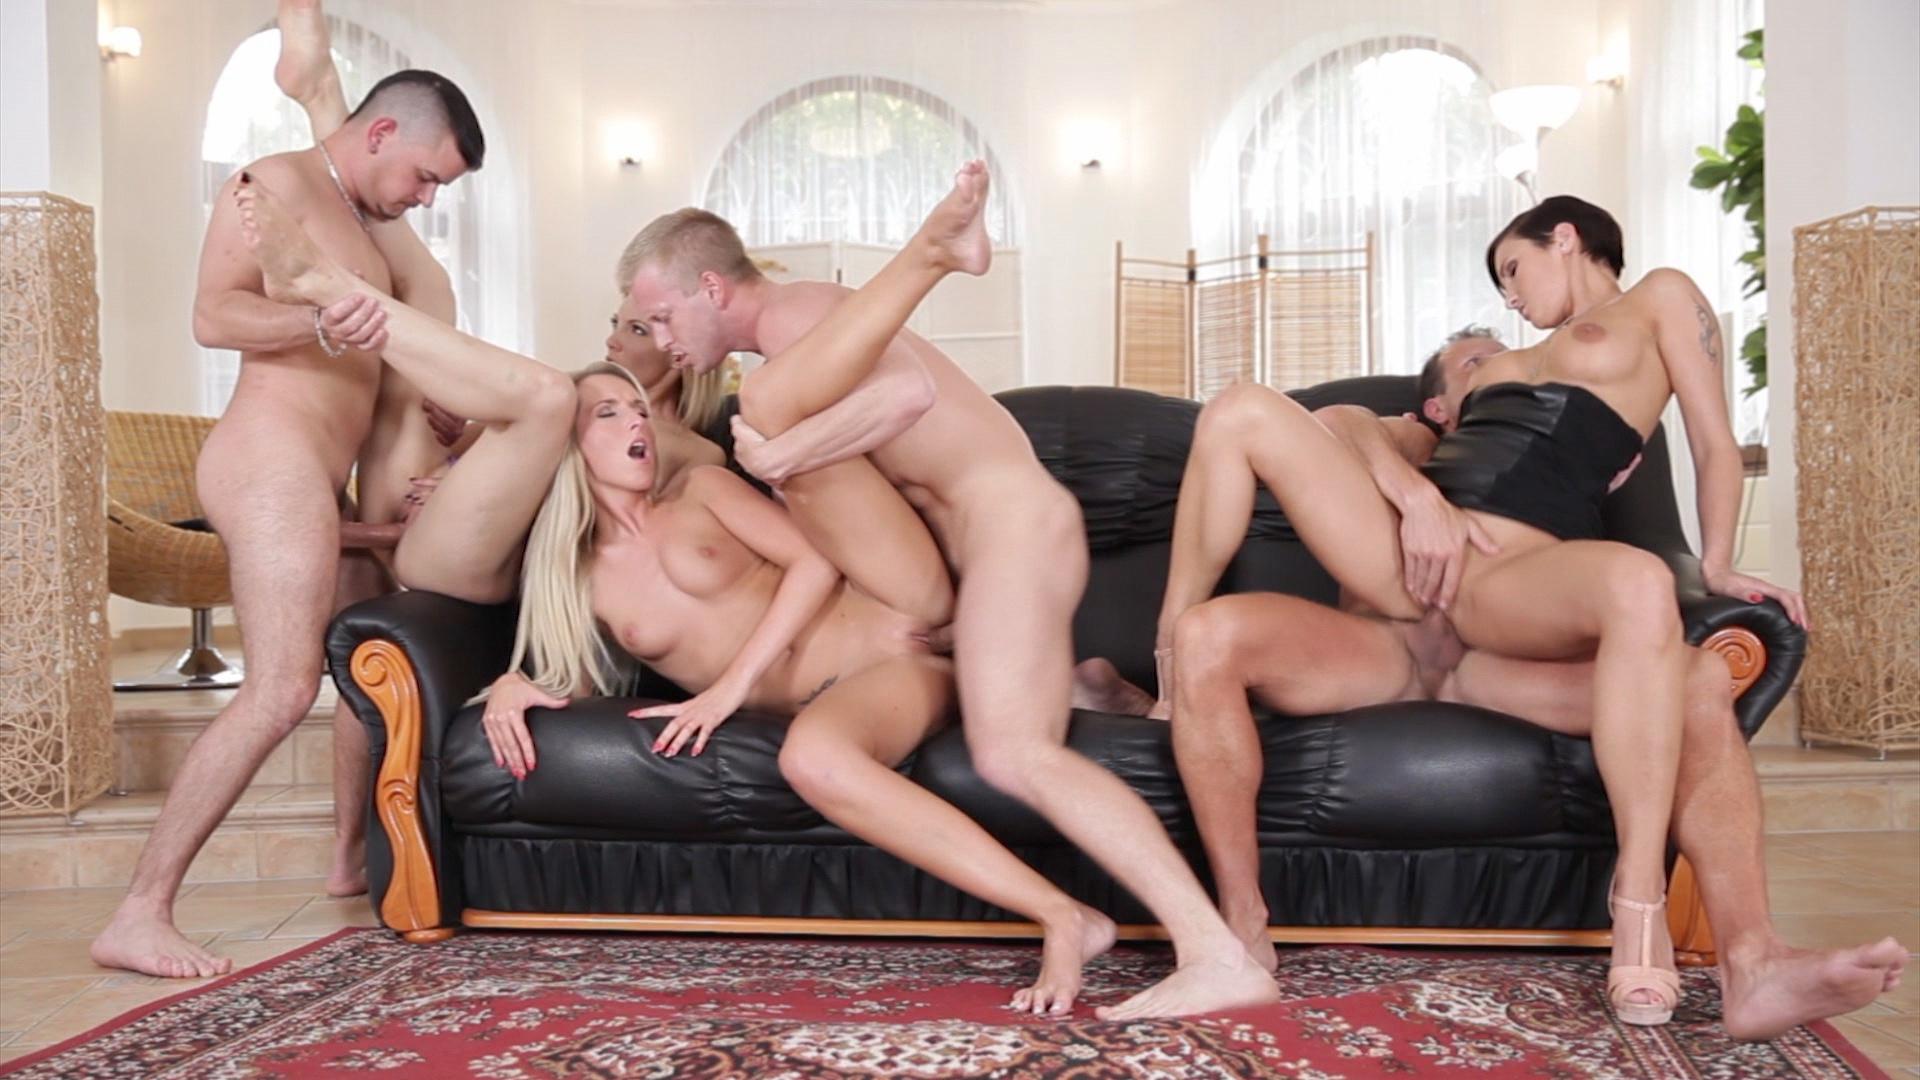 Swingers Orgies 8 xvideos